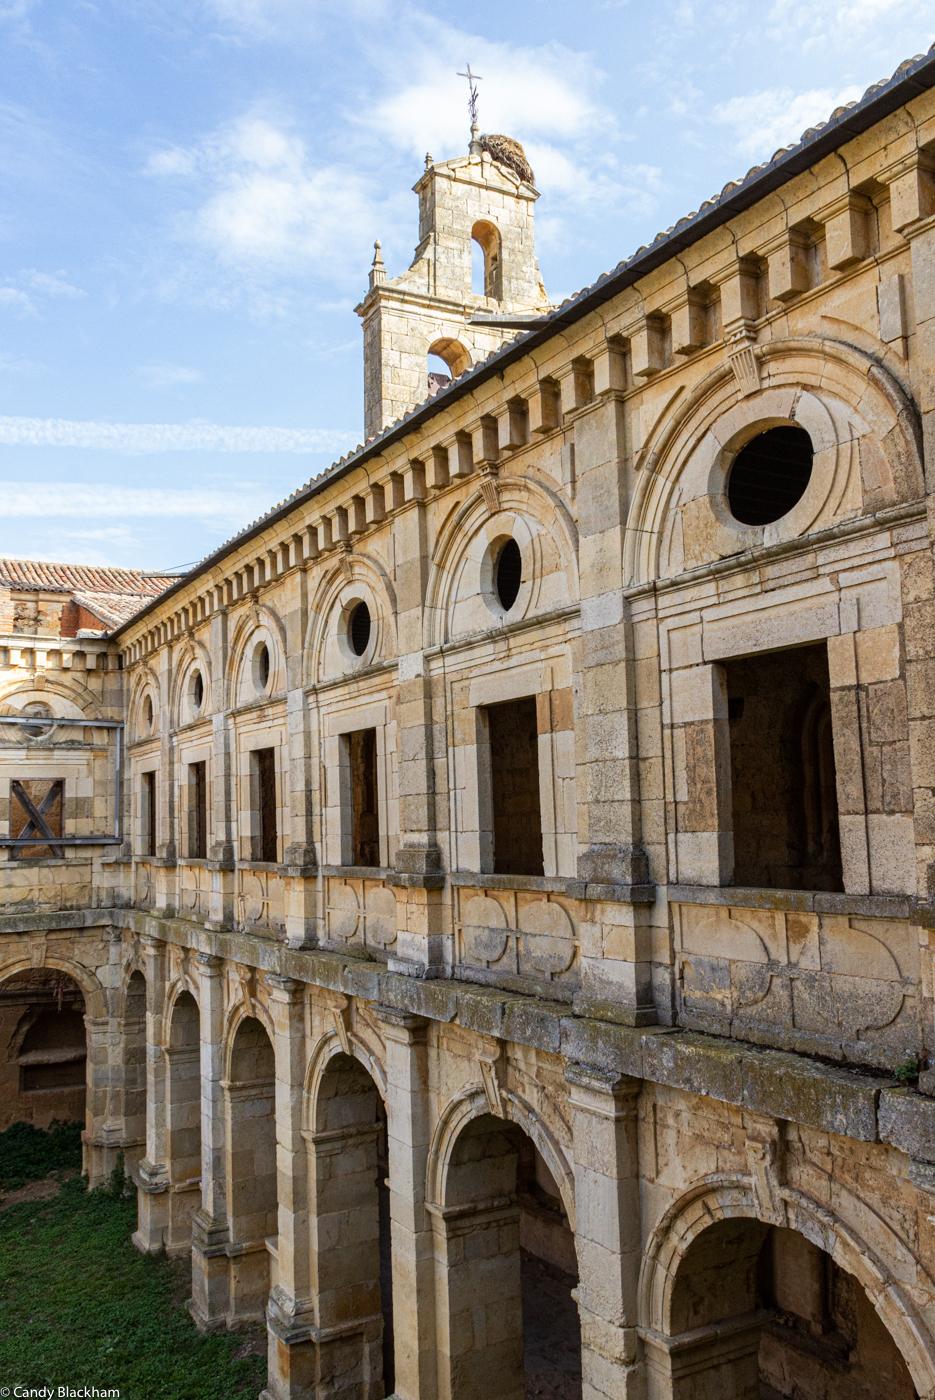 The monks' cloister at Santa Maria de Sandoval